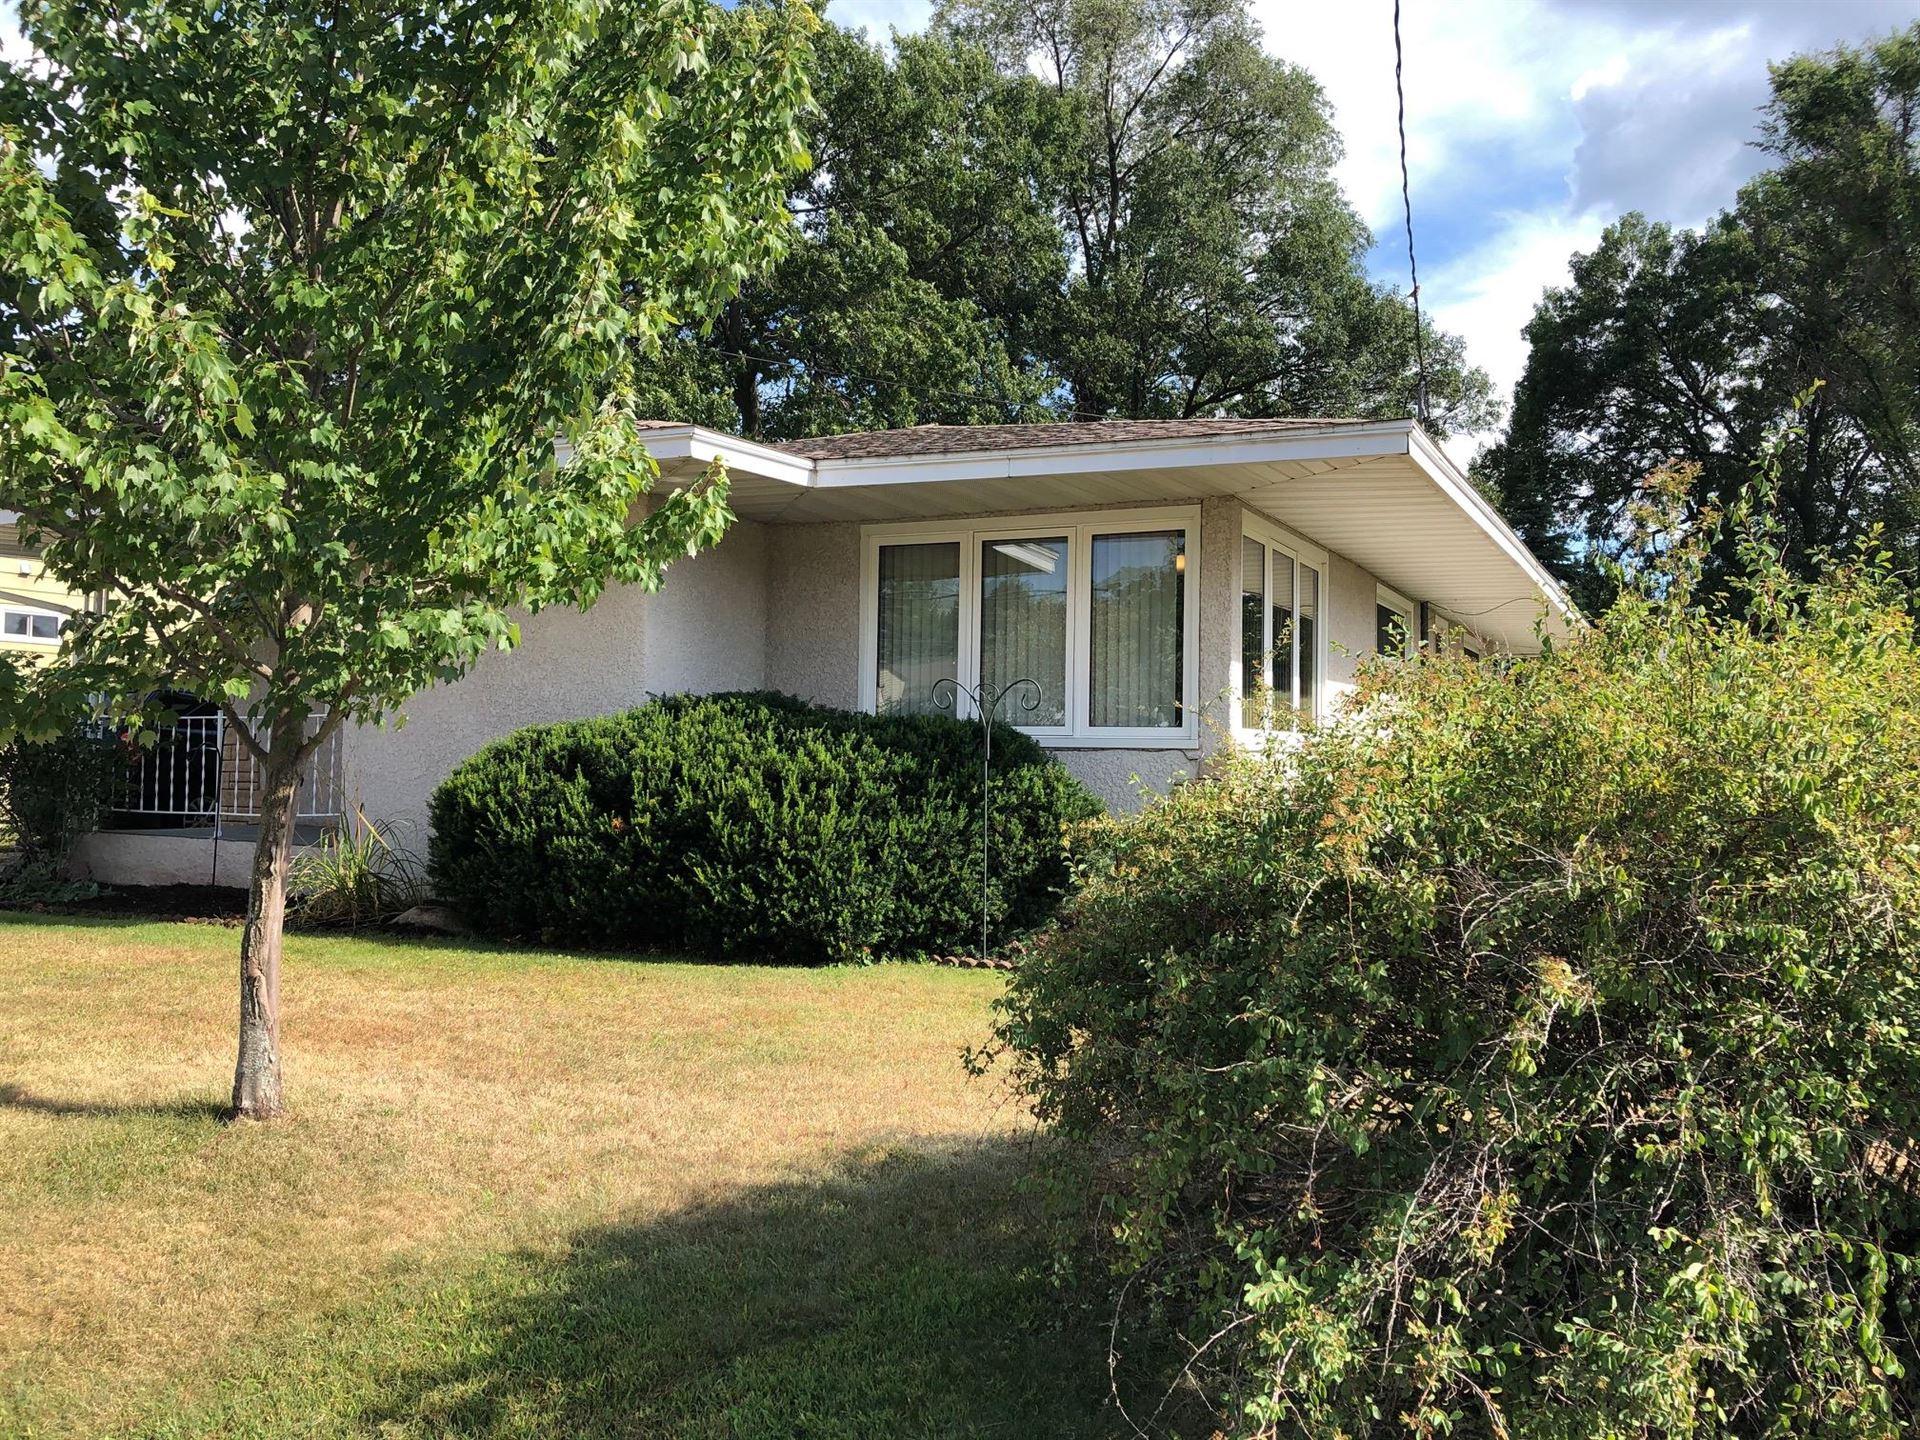 1020 Wilson ST, Onalaska, WI 54650 - MLS#: 1702100